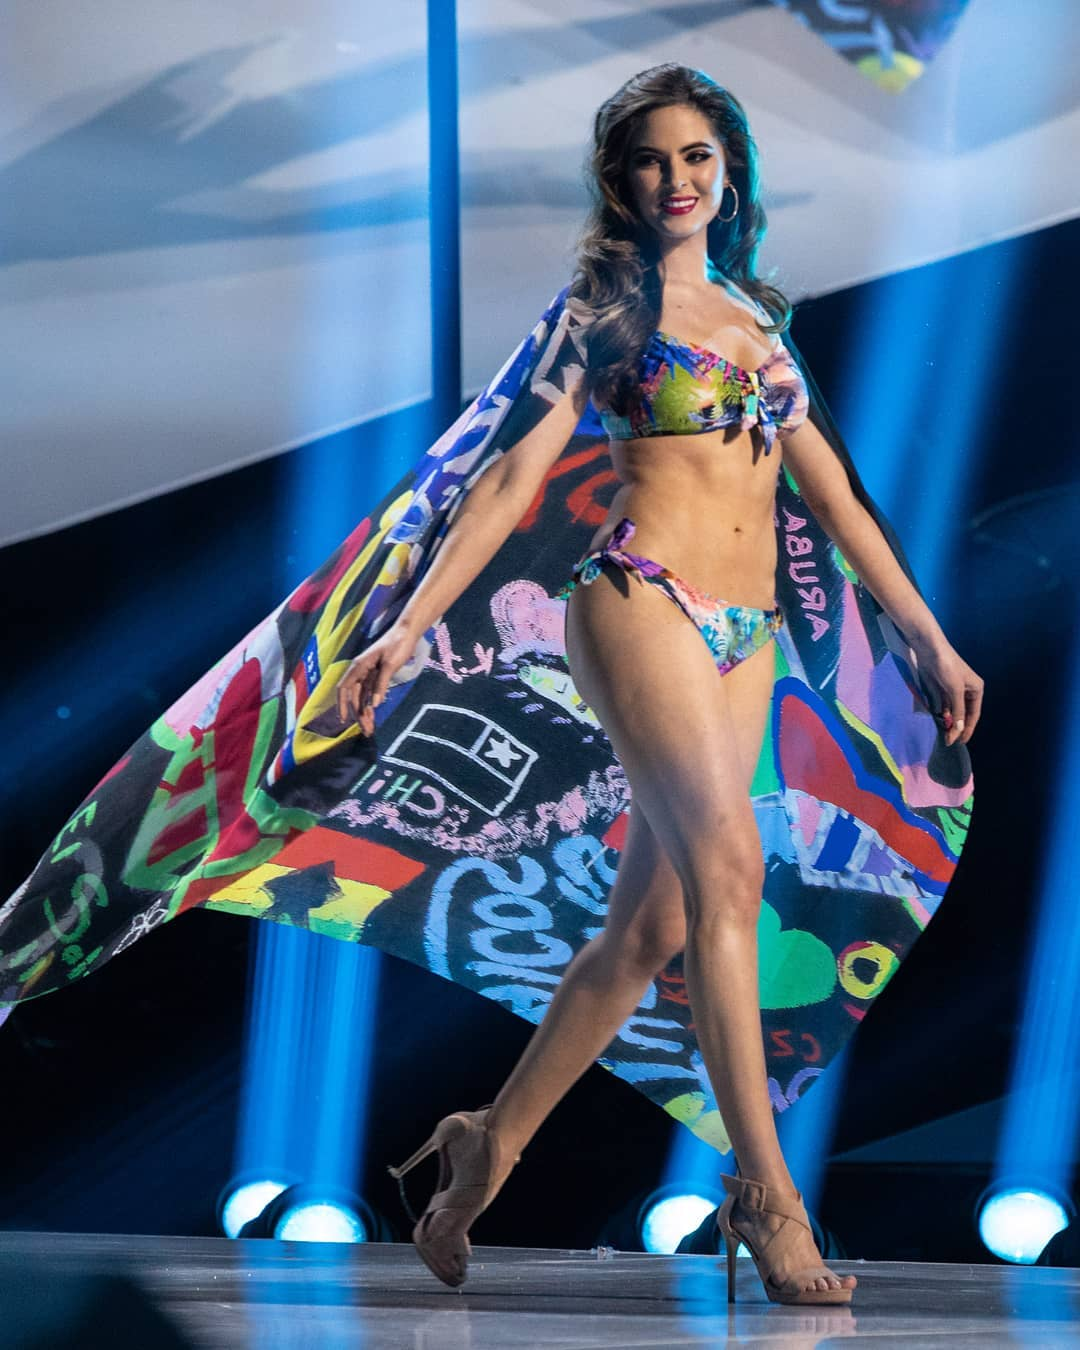 sofia aragon, 2nd runner-up de miss universe 2019. - Página 16 75272125